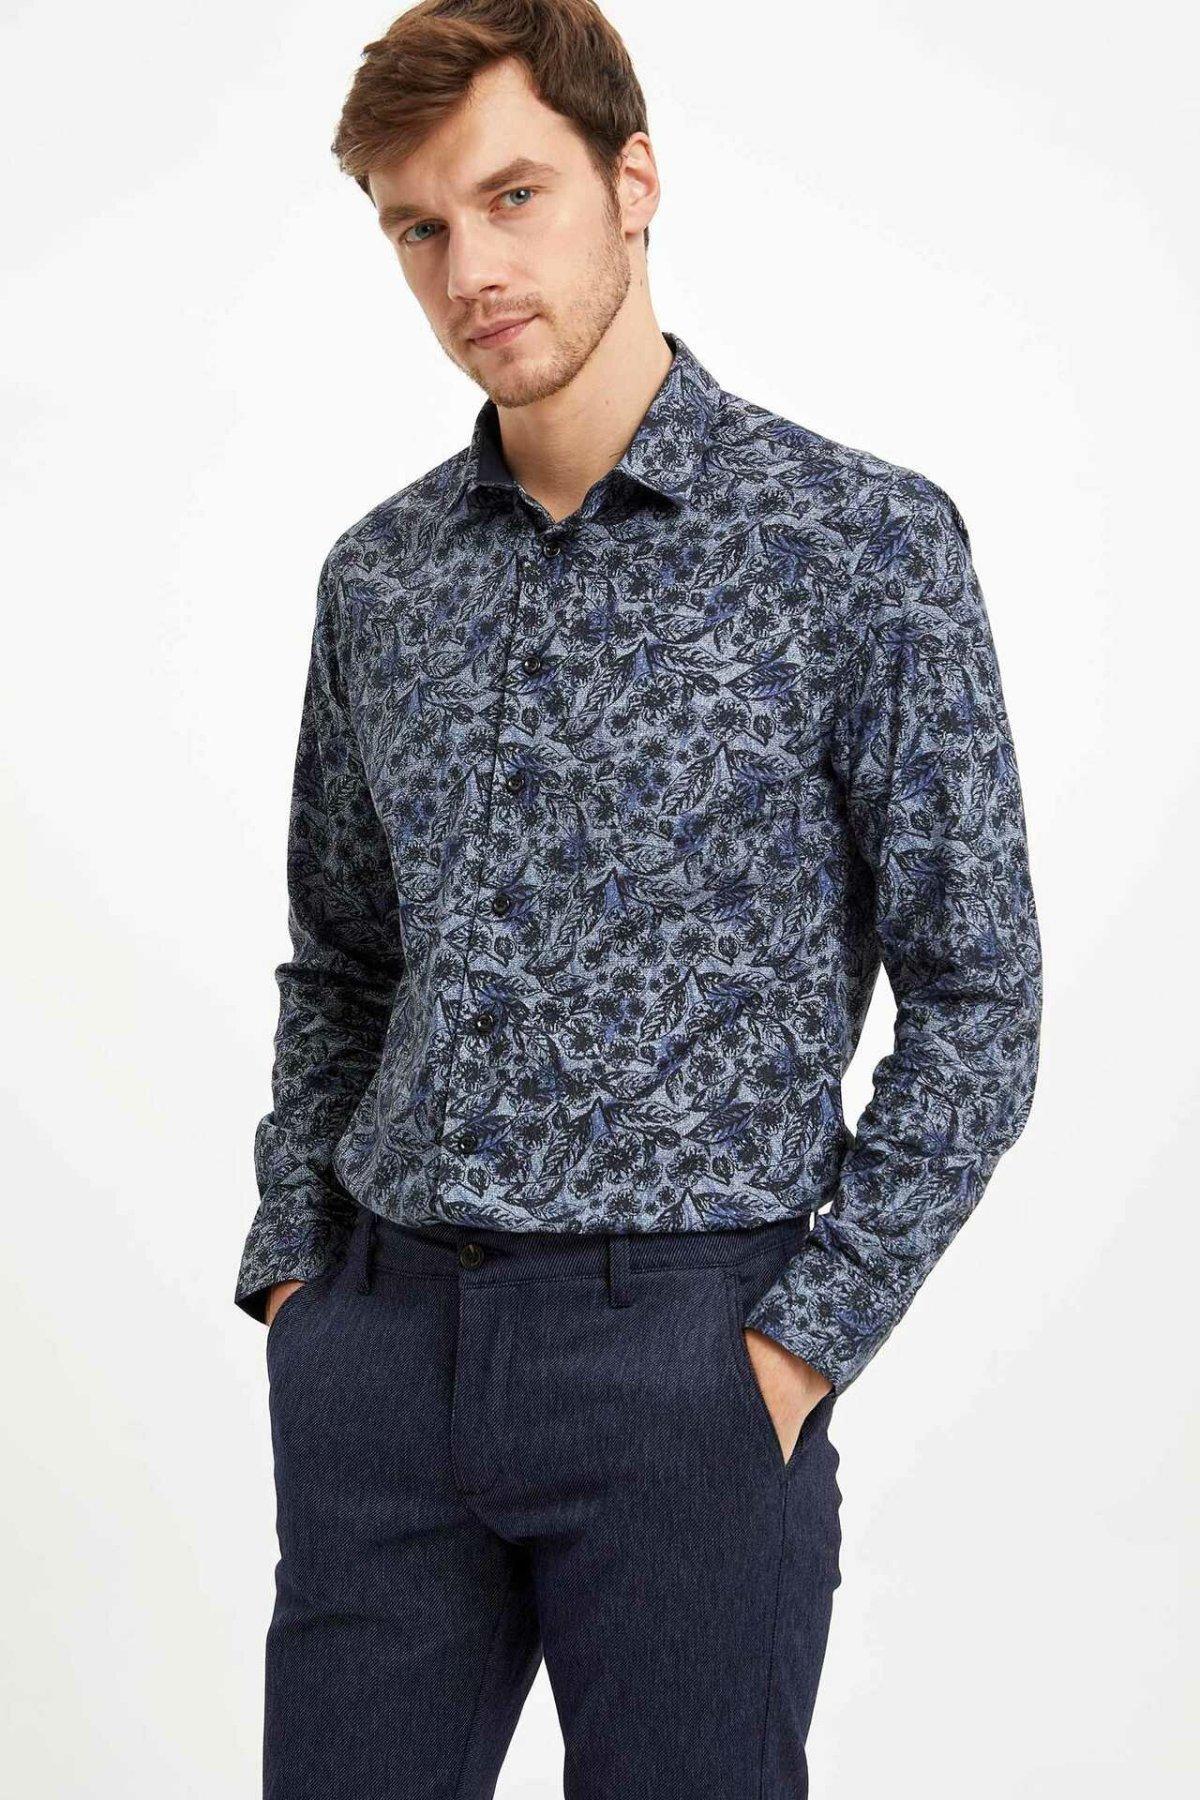 DeFacto Vintage Floral Prints Men Shirts Winter Man Long Sleeve Top Shirt Men Casual Smart Shirts-M2869AZ19WN